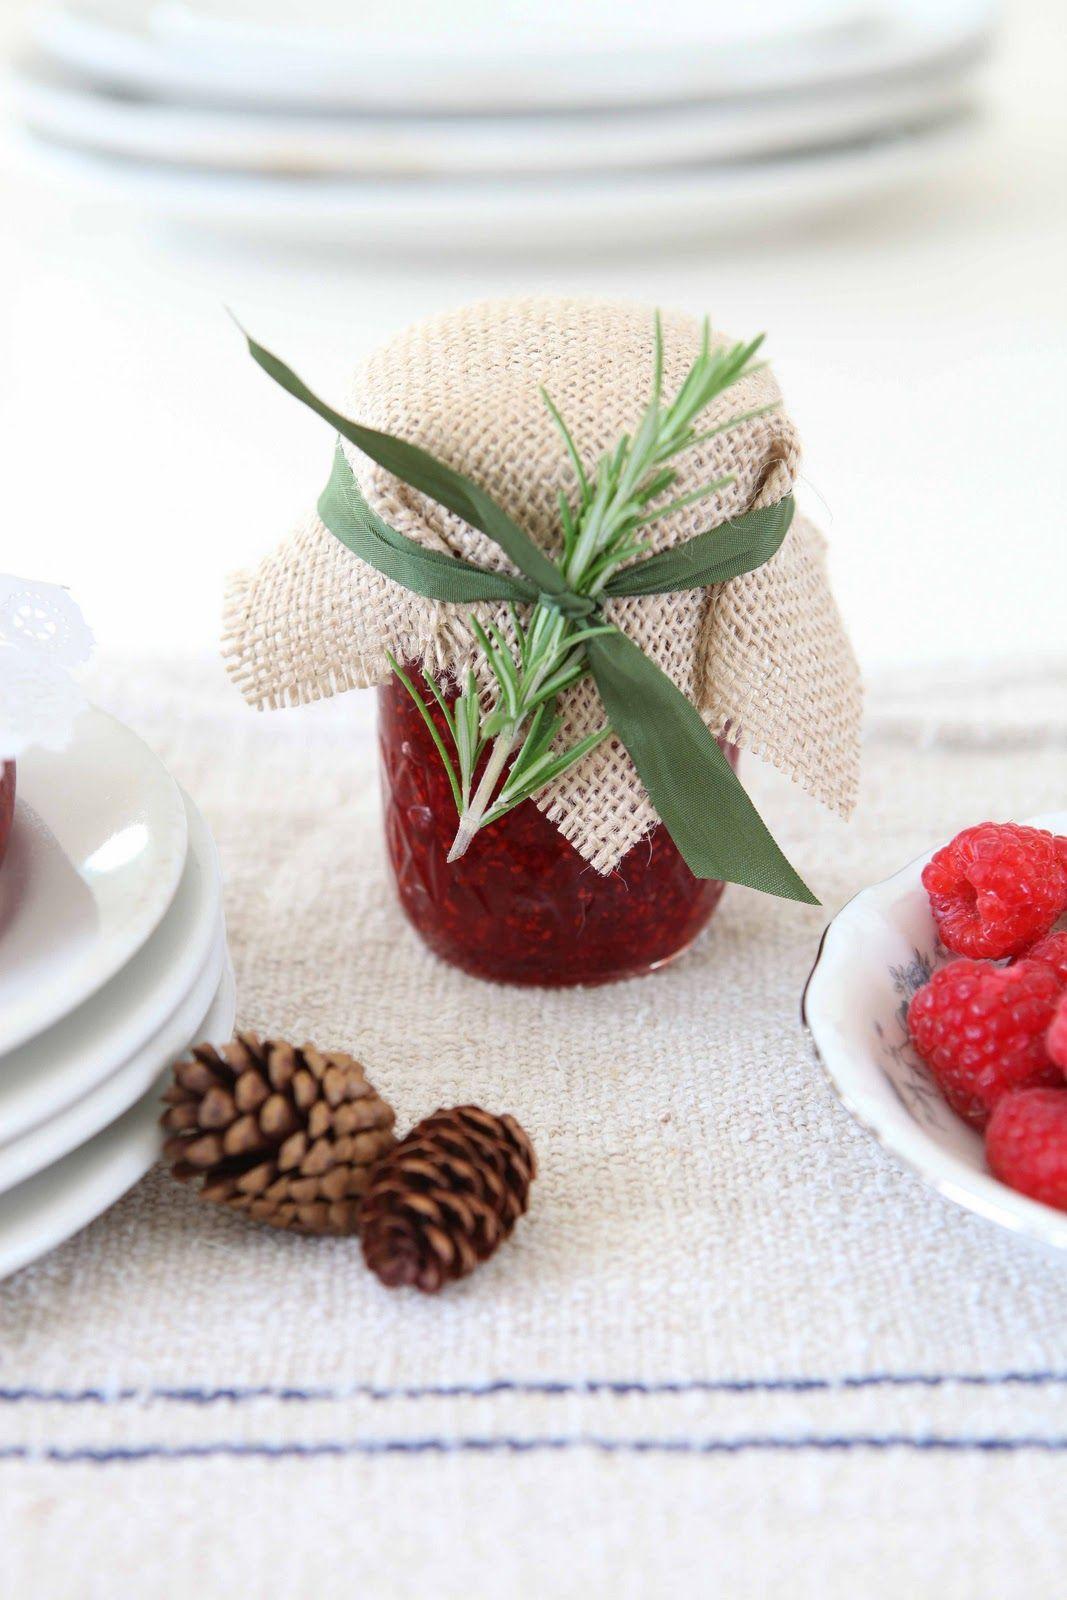 Make raspberry jam as a gift. | Homemade jams and jellies ...